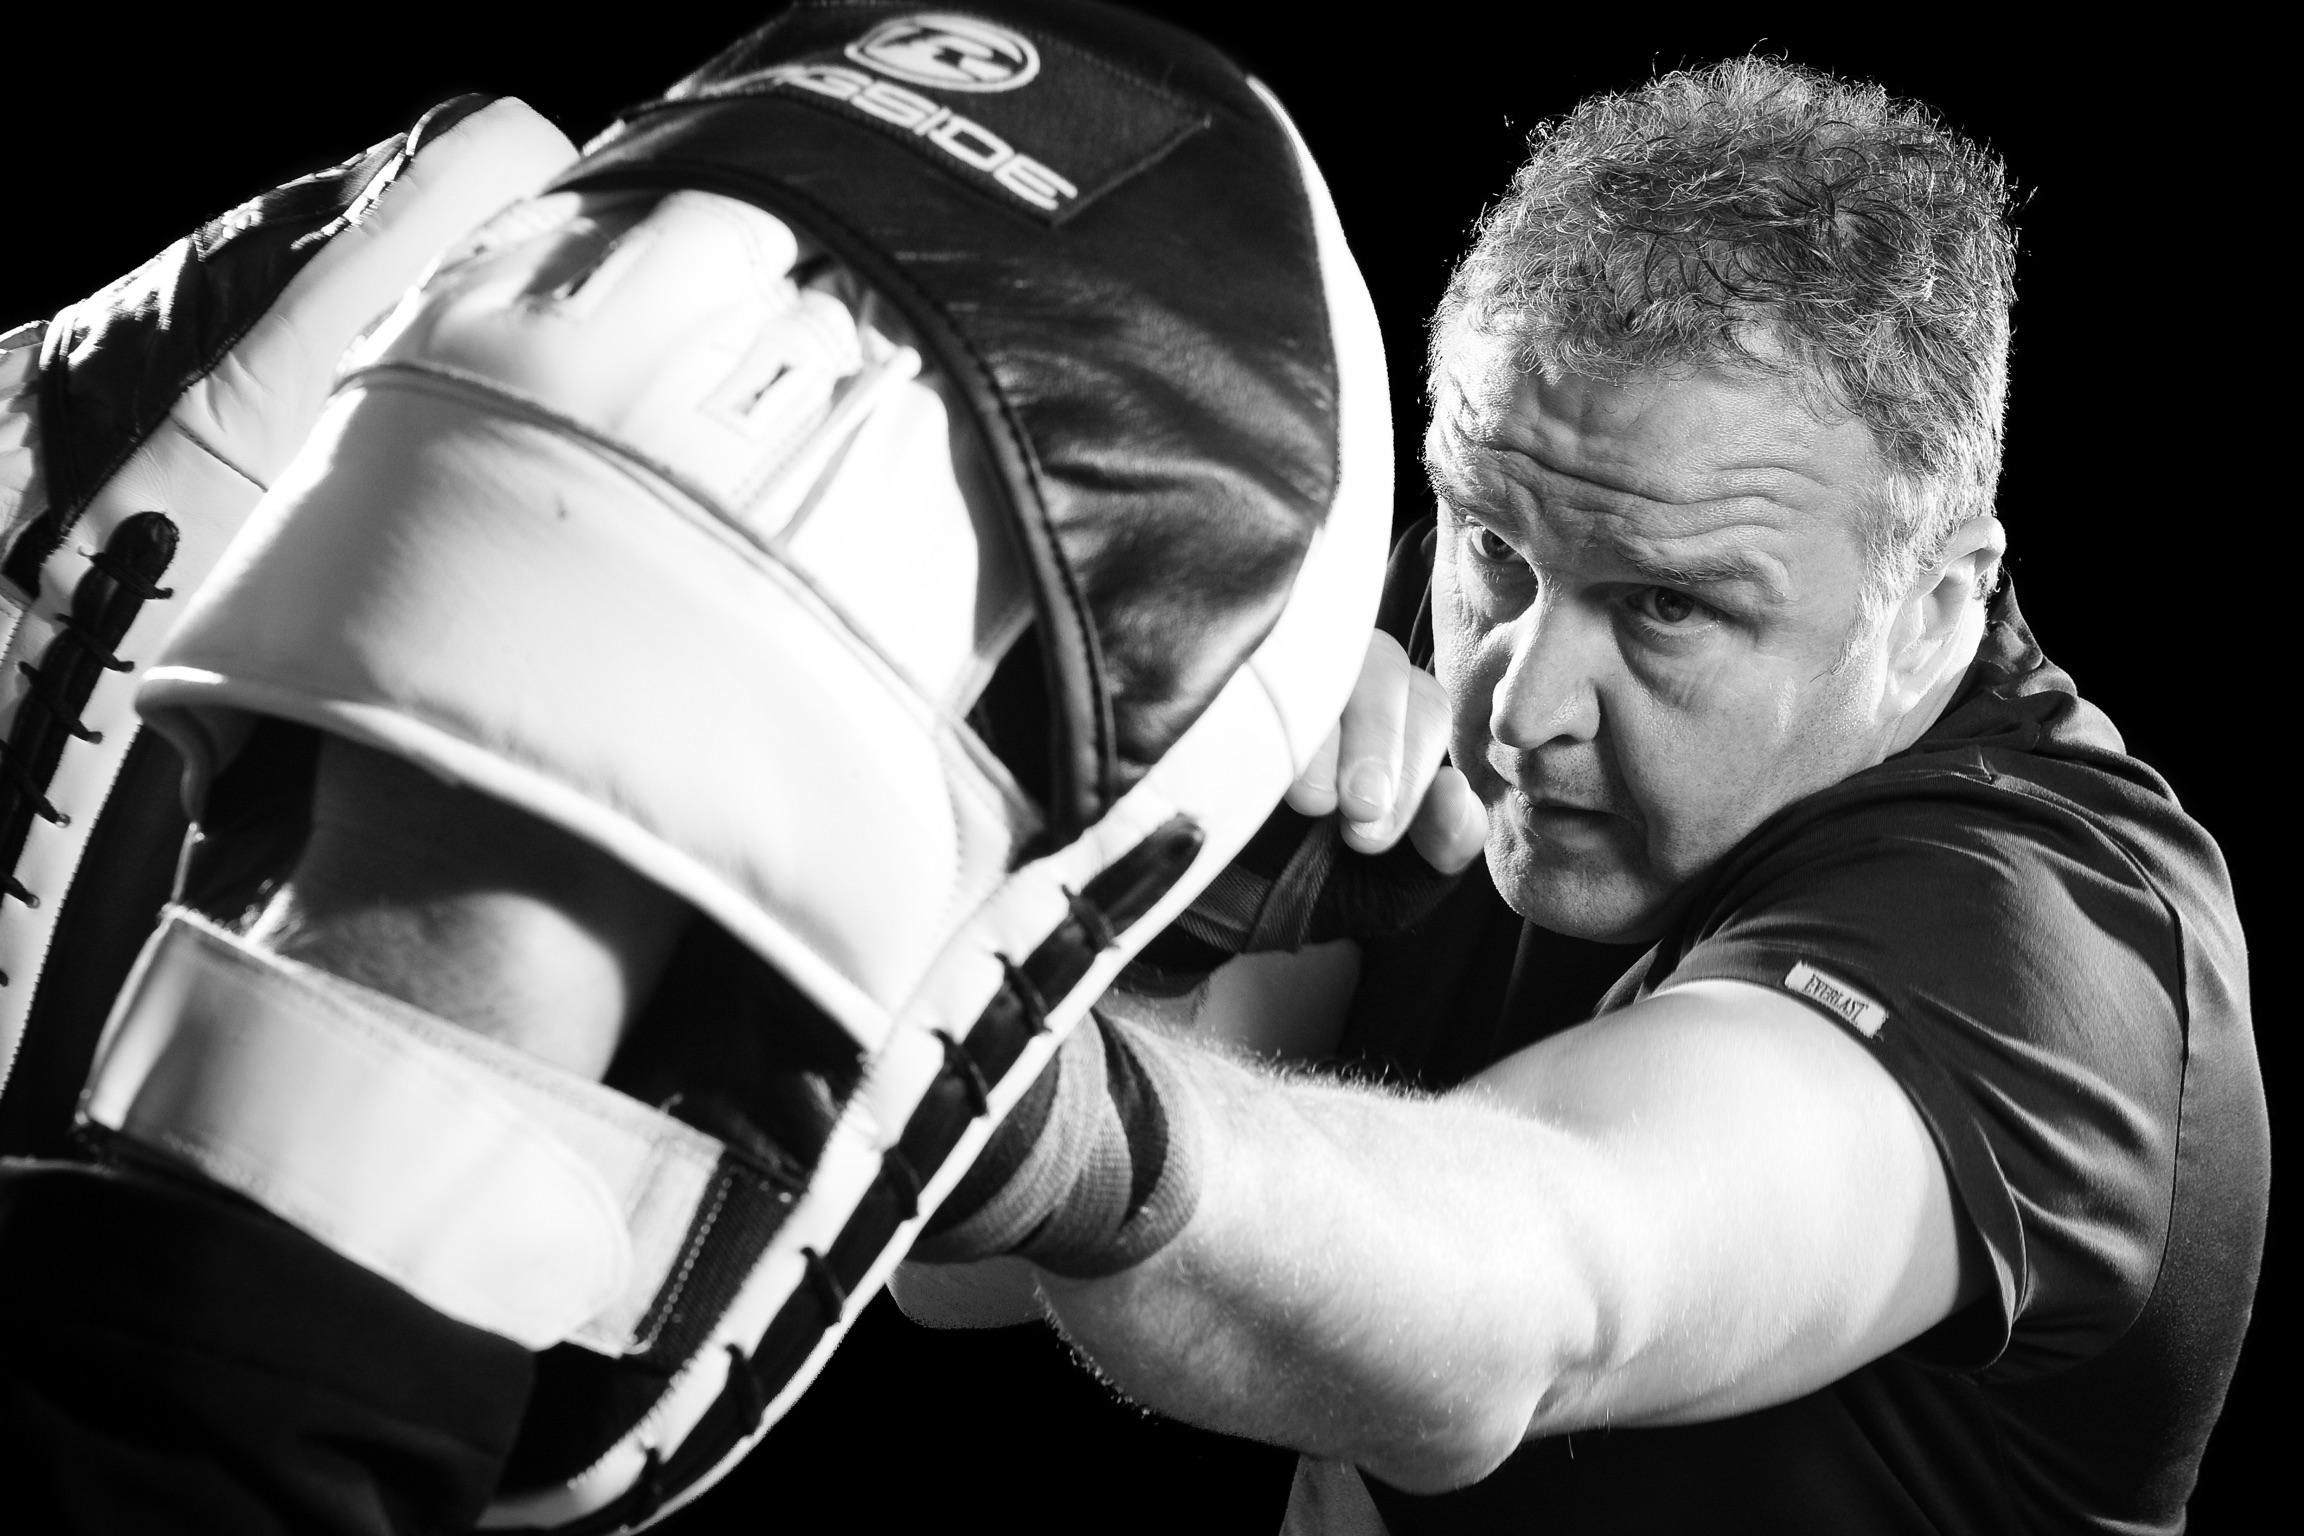 Touchglove Promotions Boxing Fight Match Nina Cranstoun Tony Denham Carlton Leach Football Factory Rise of the Footsoldier